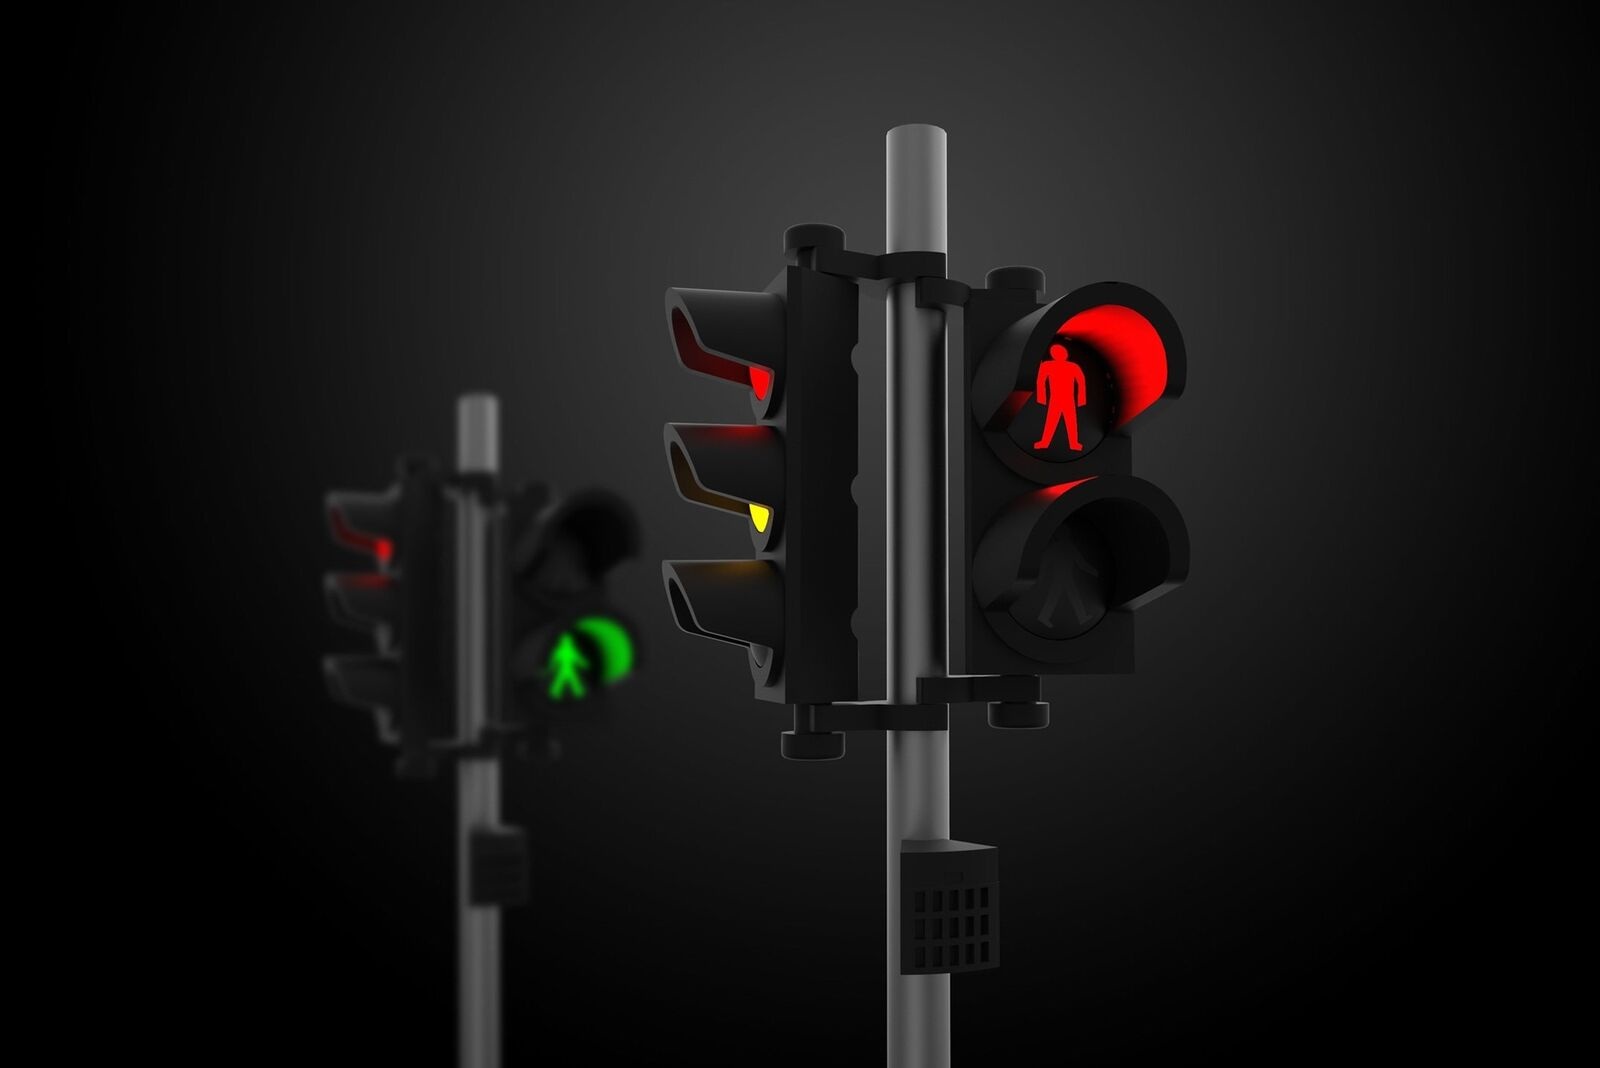 TINY Hong Kong City Scale 1 76 Ax1 Traffic Light Set Lighting Accessories Model